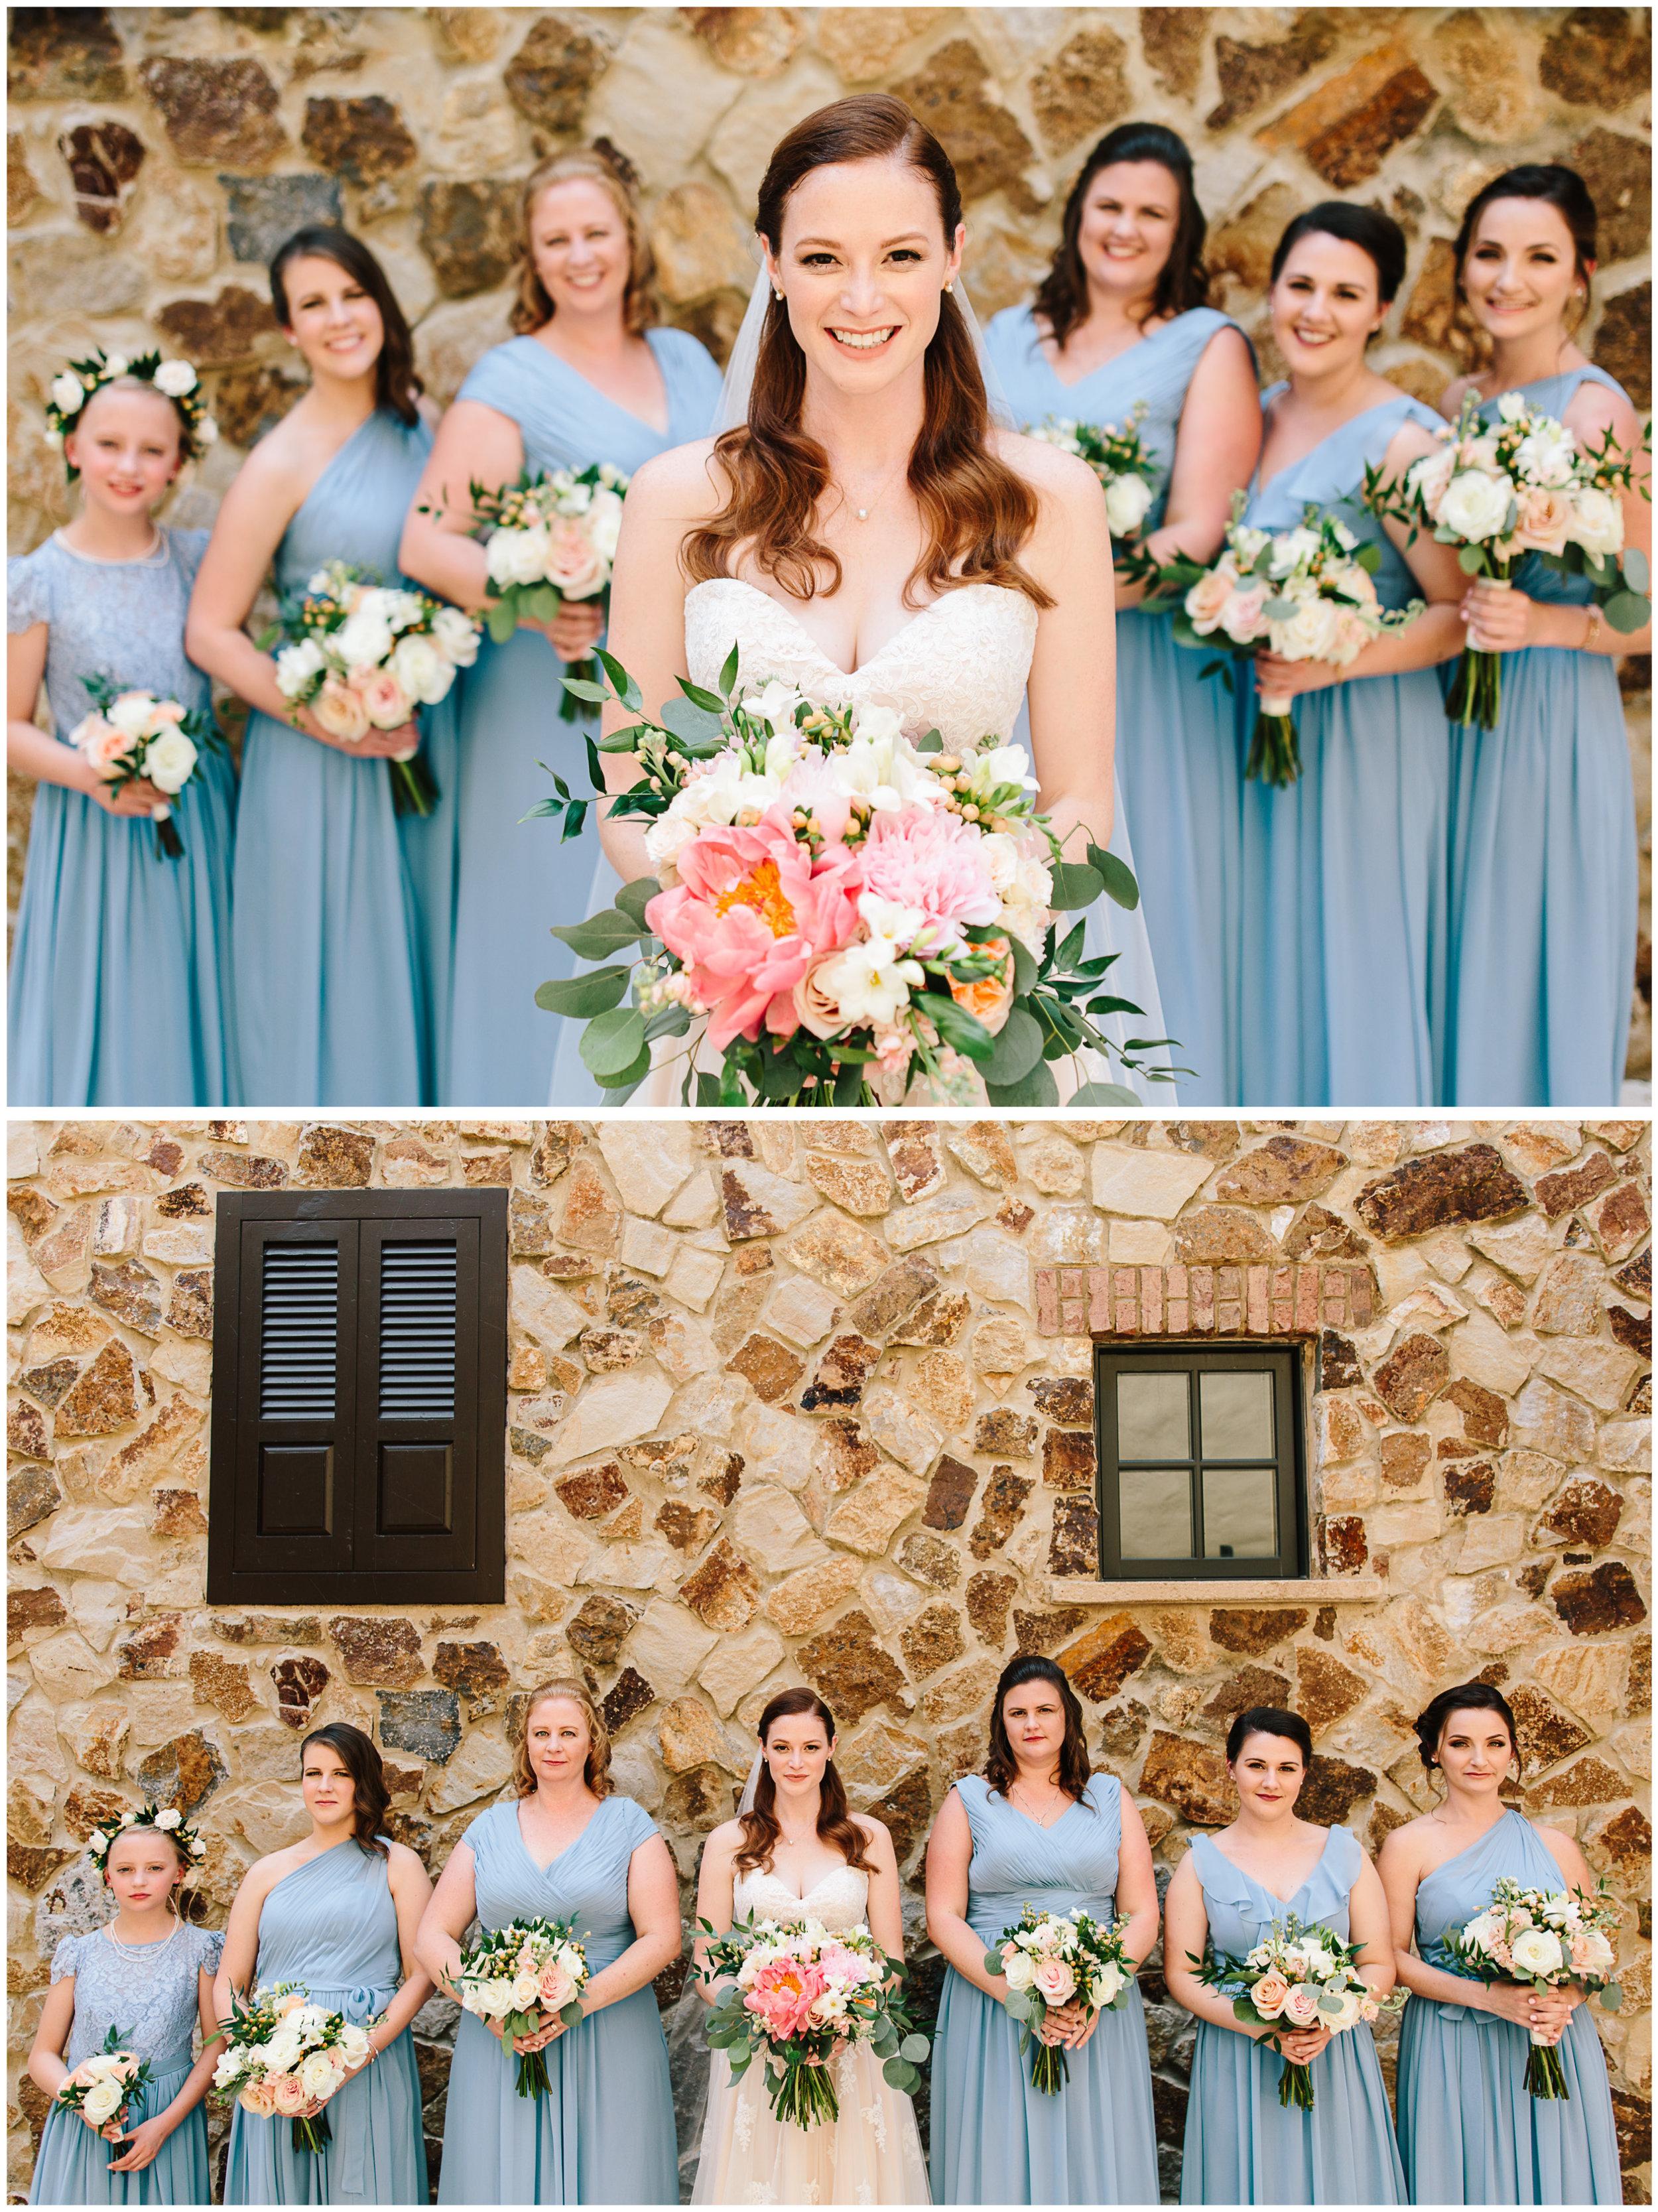 bella_collina_wedding_55.jpg